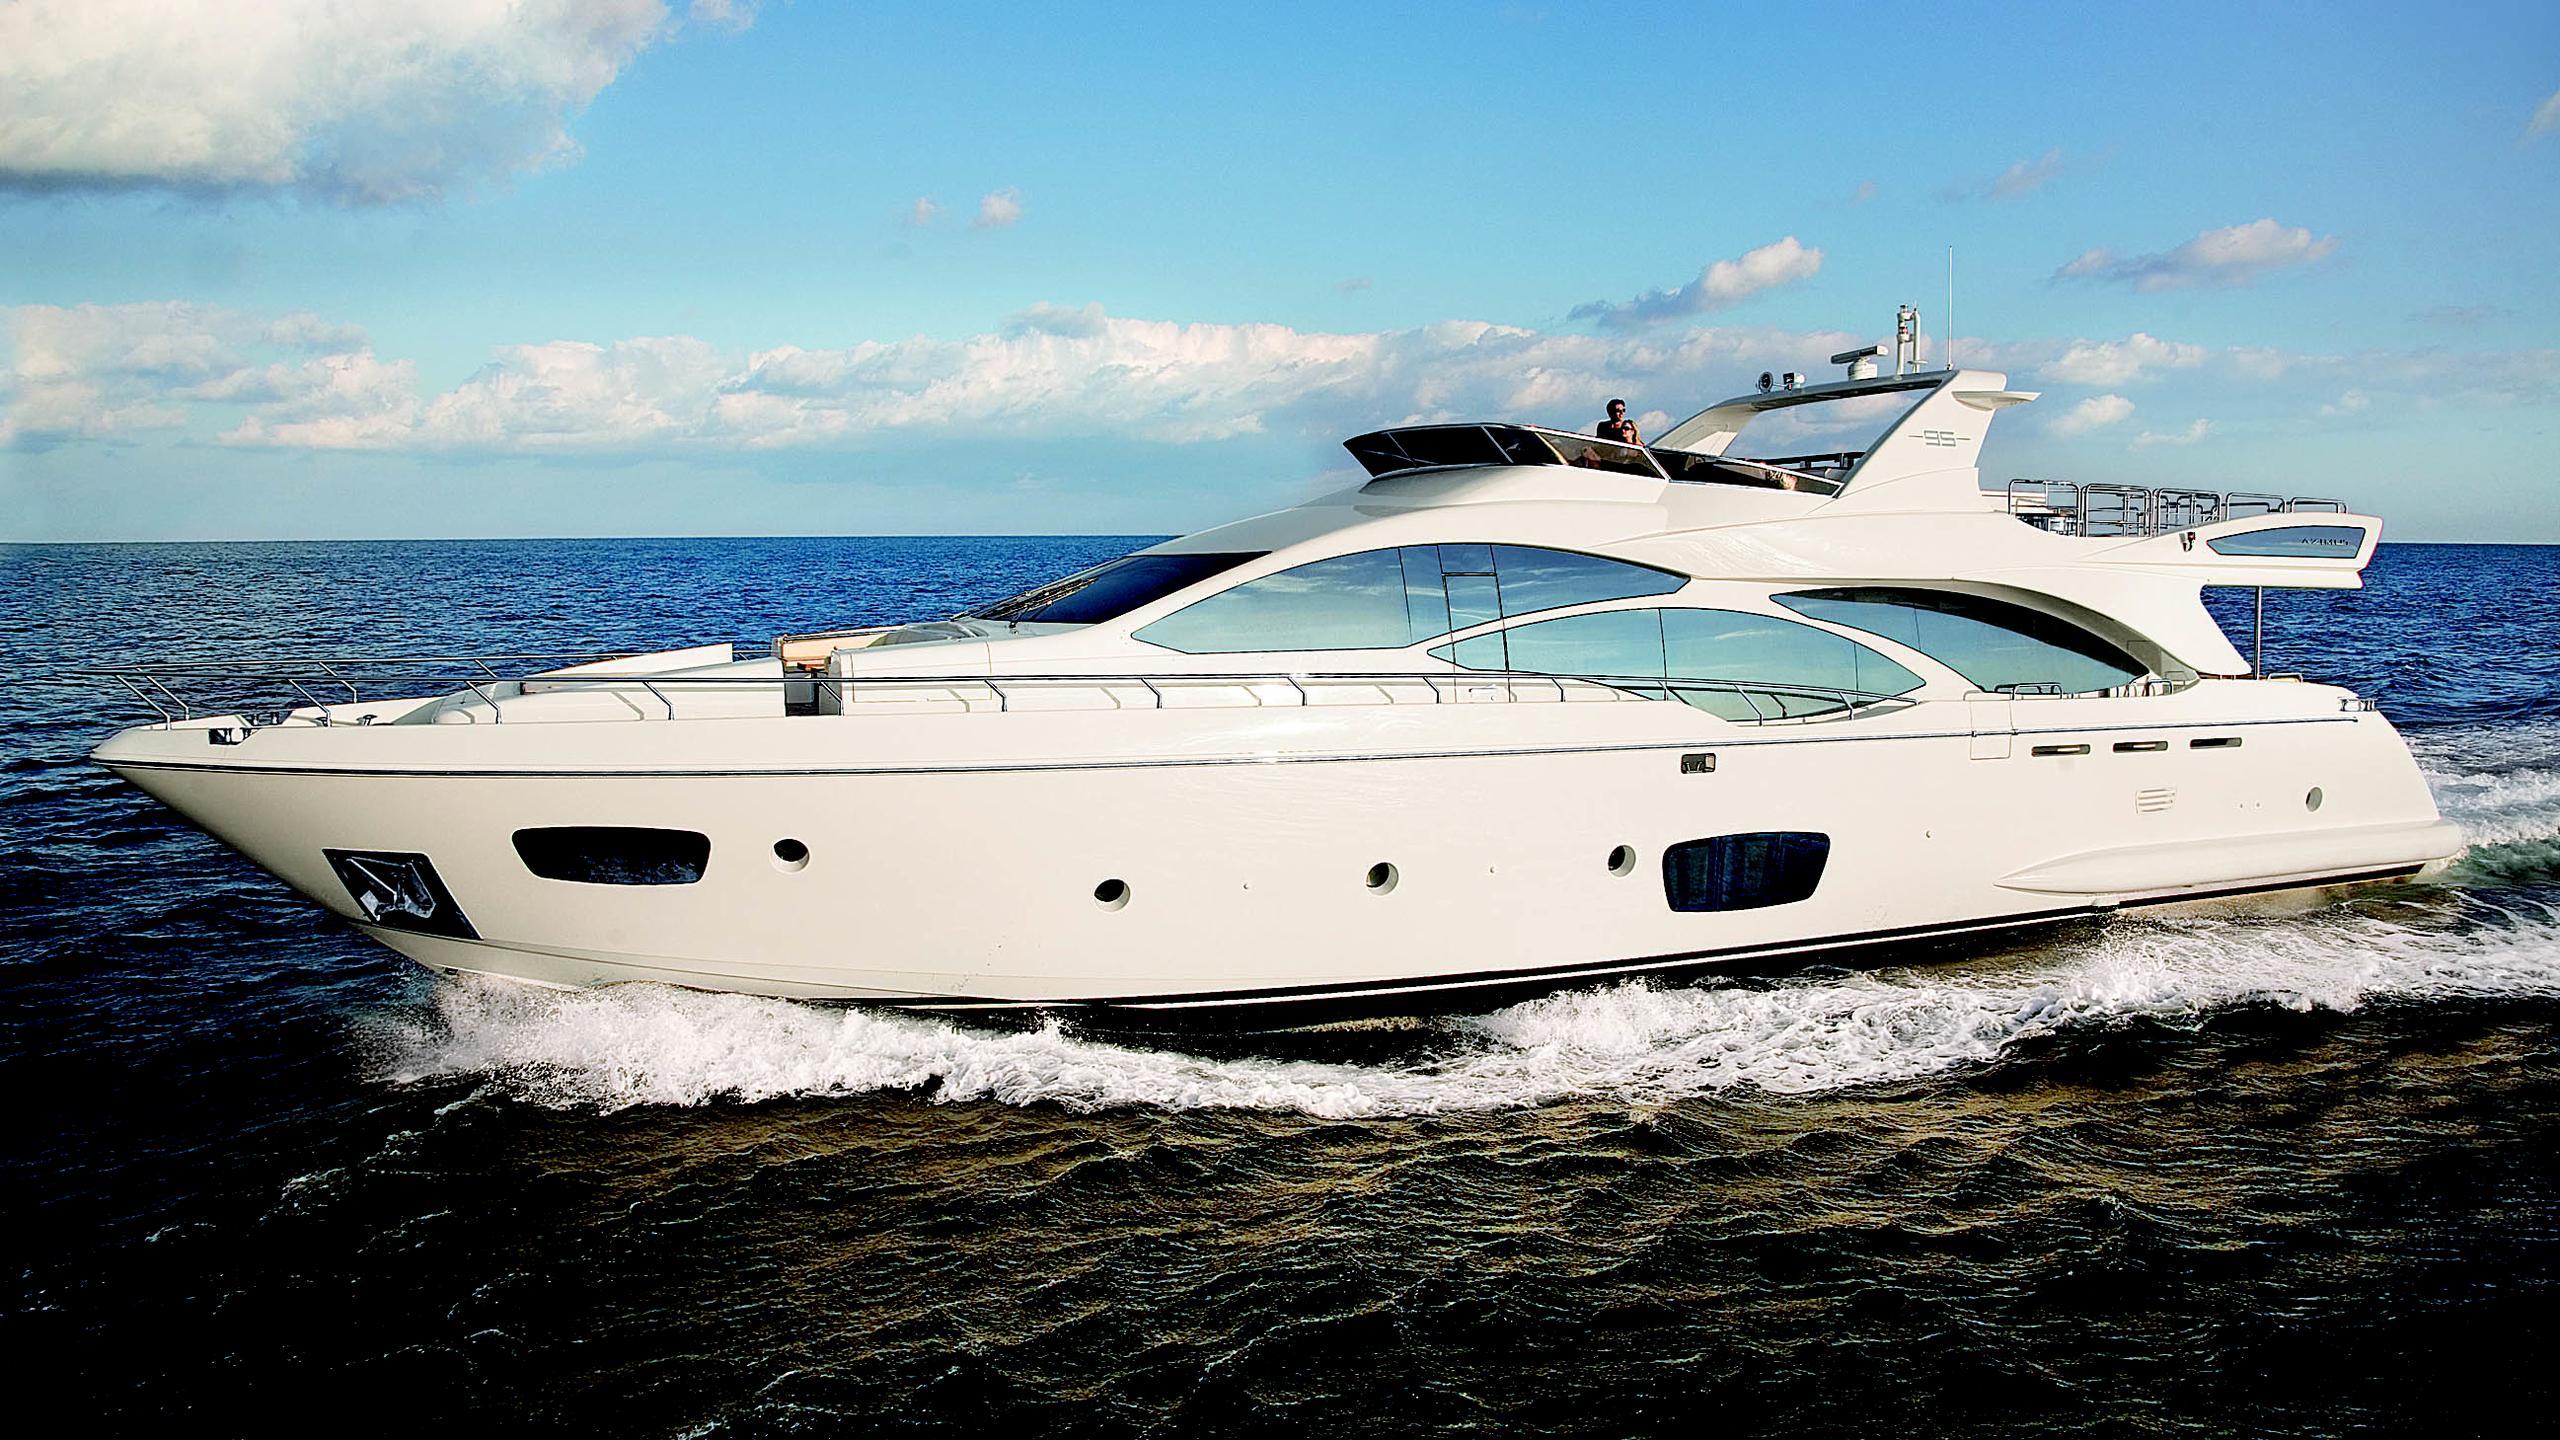 sorridente-azimut-95-motor-yacht-2010-30m-profile